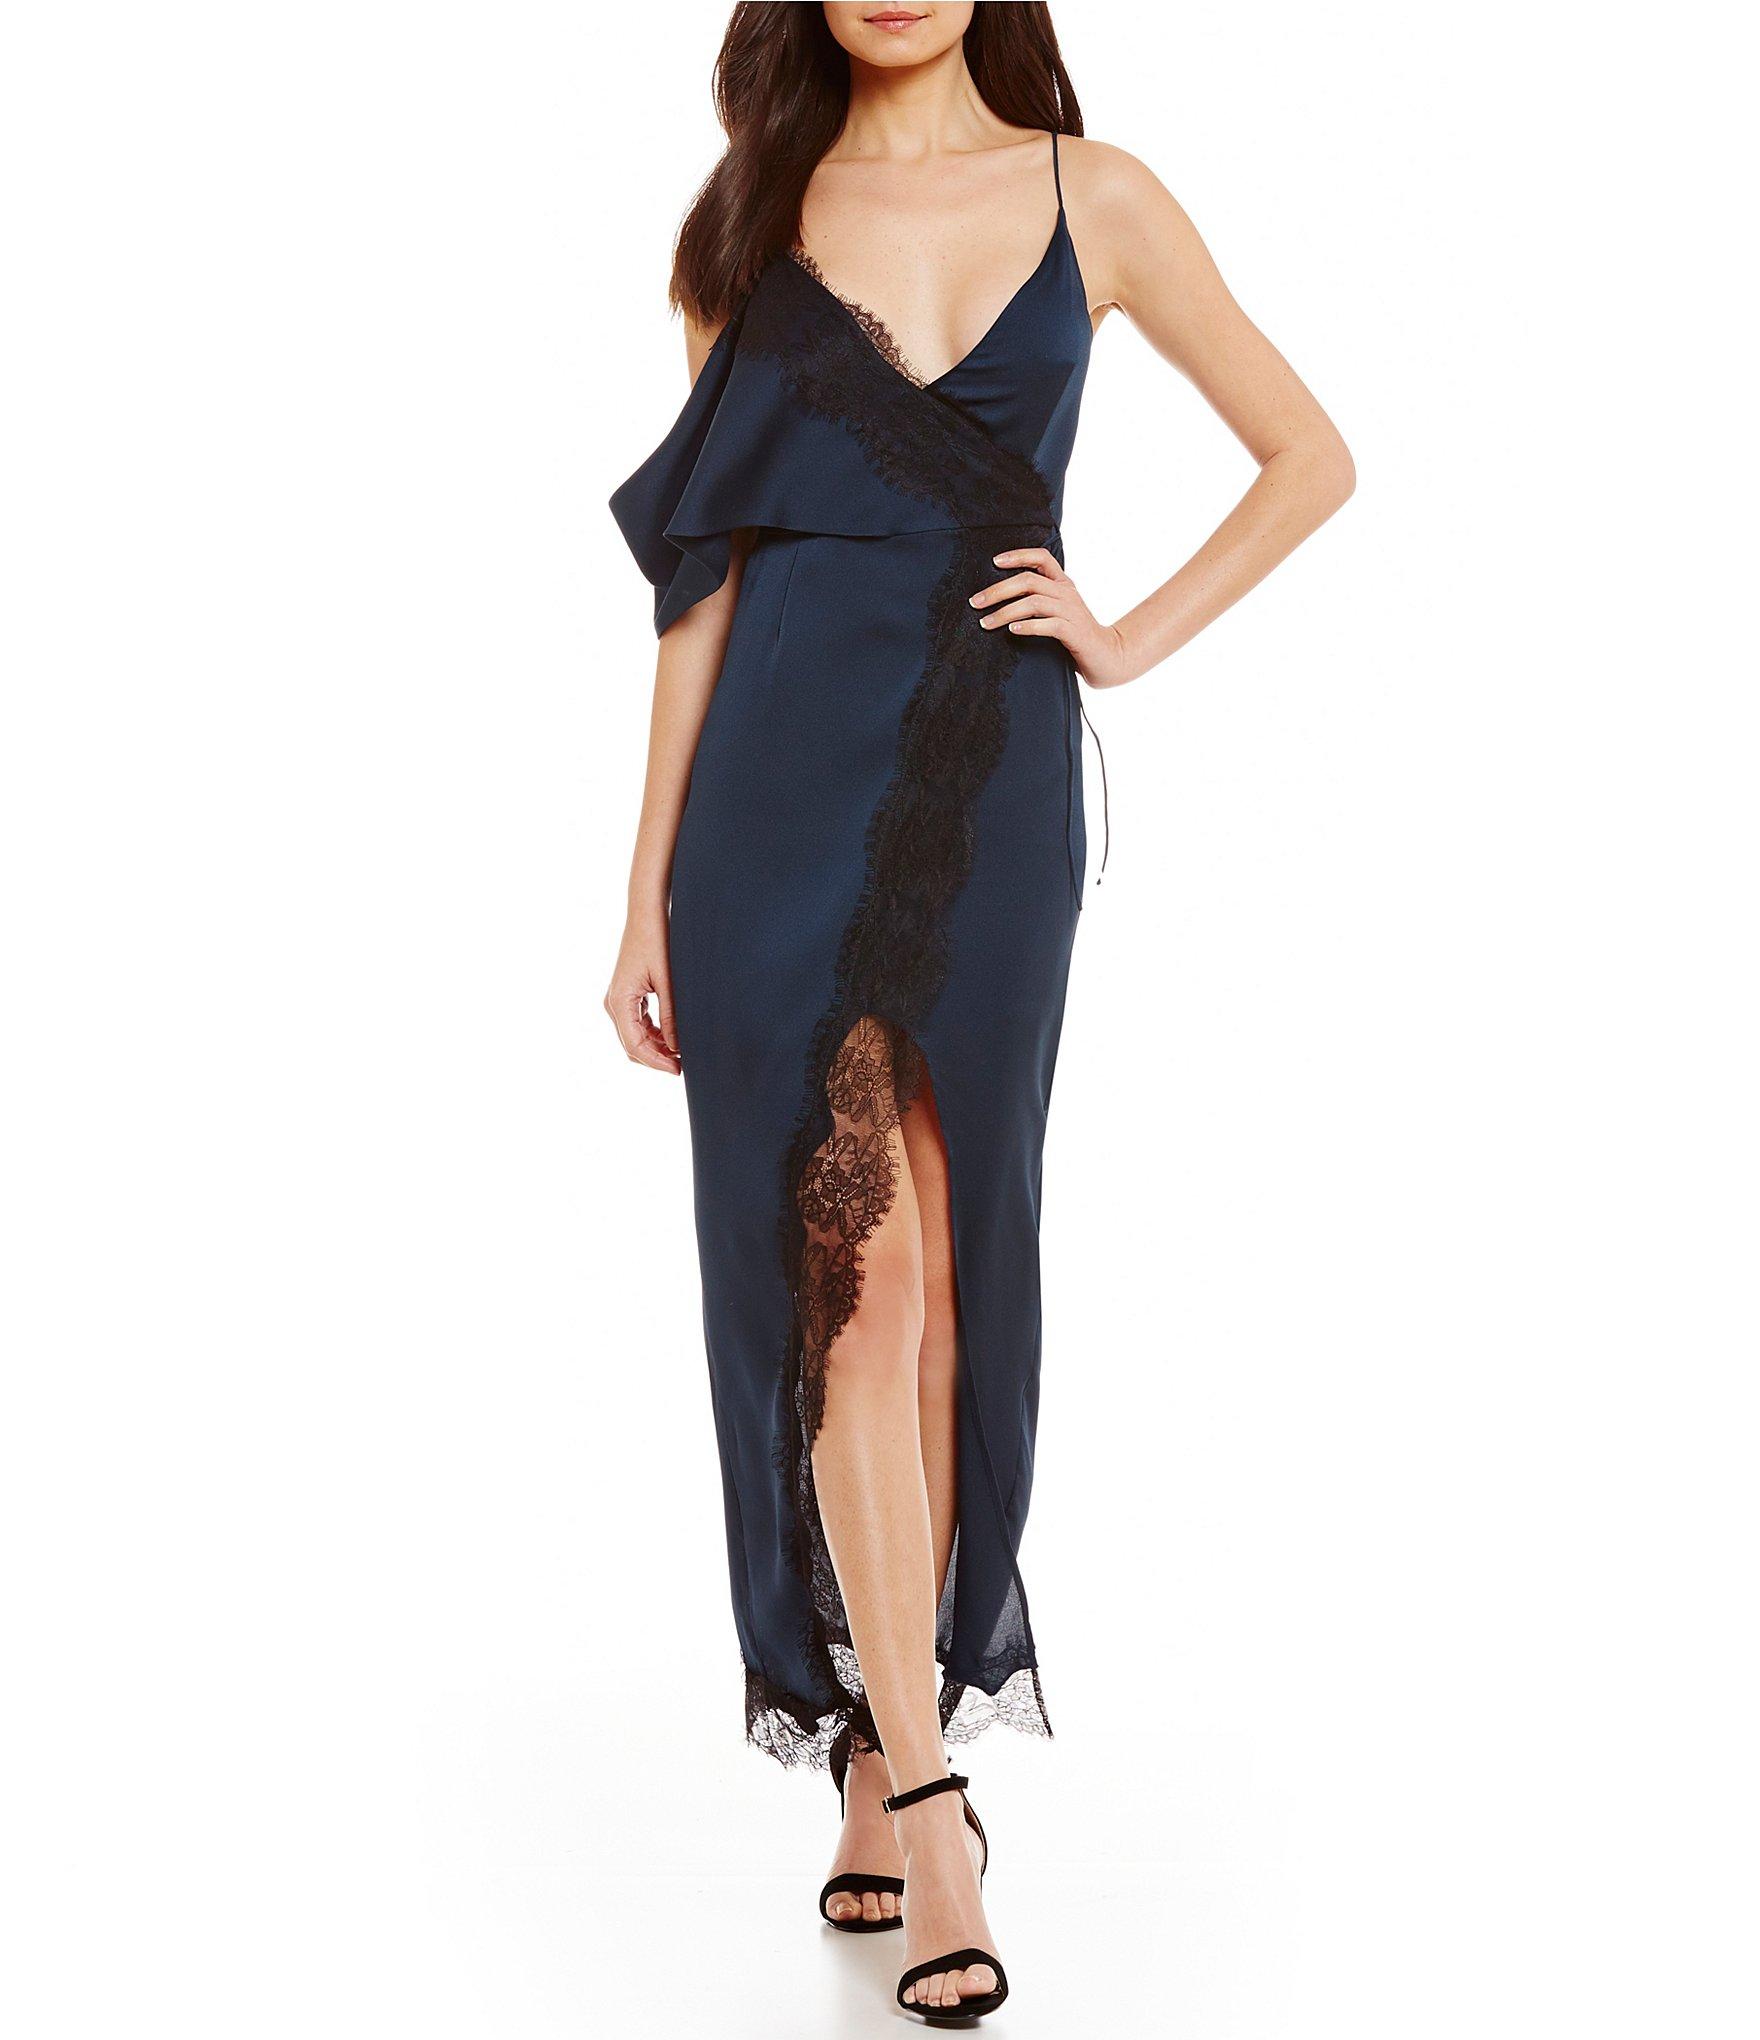 Chelsea girl cream lace maxi dress